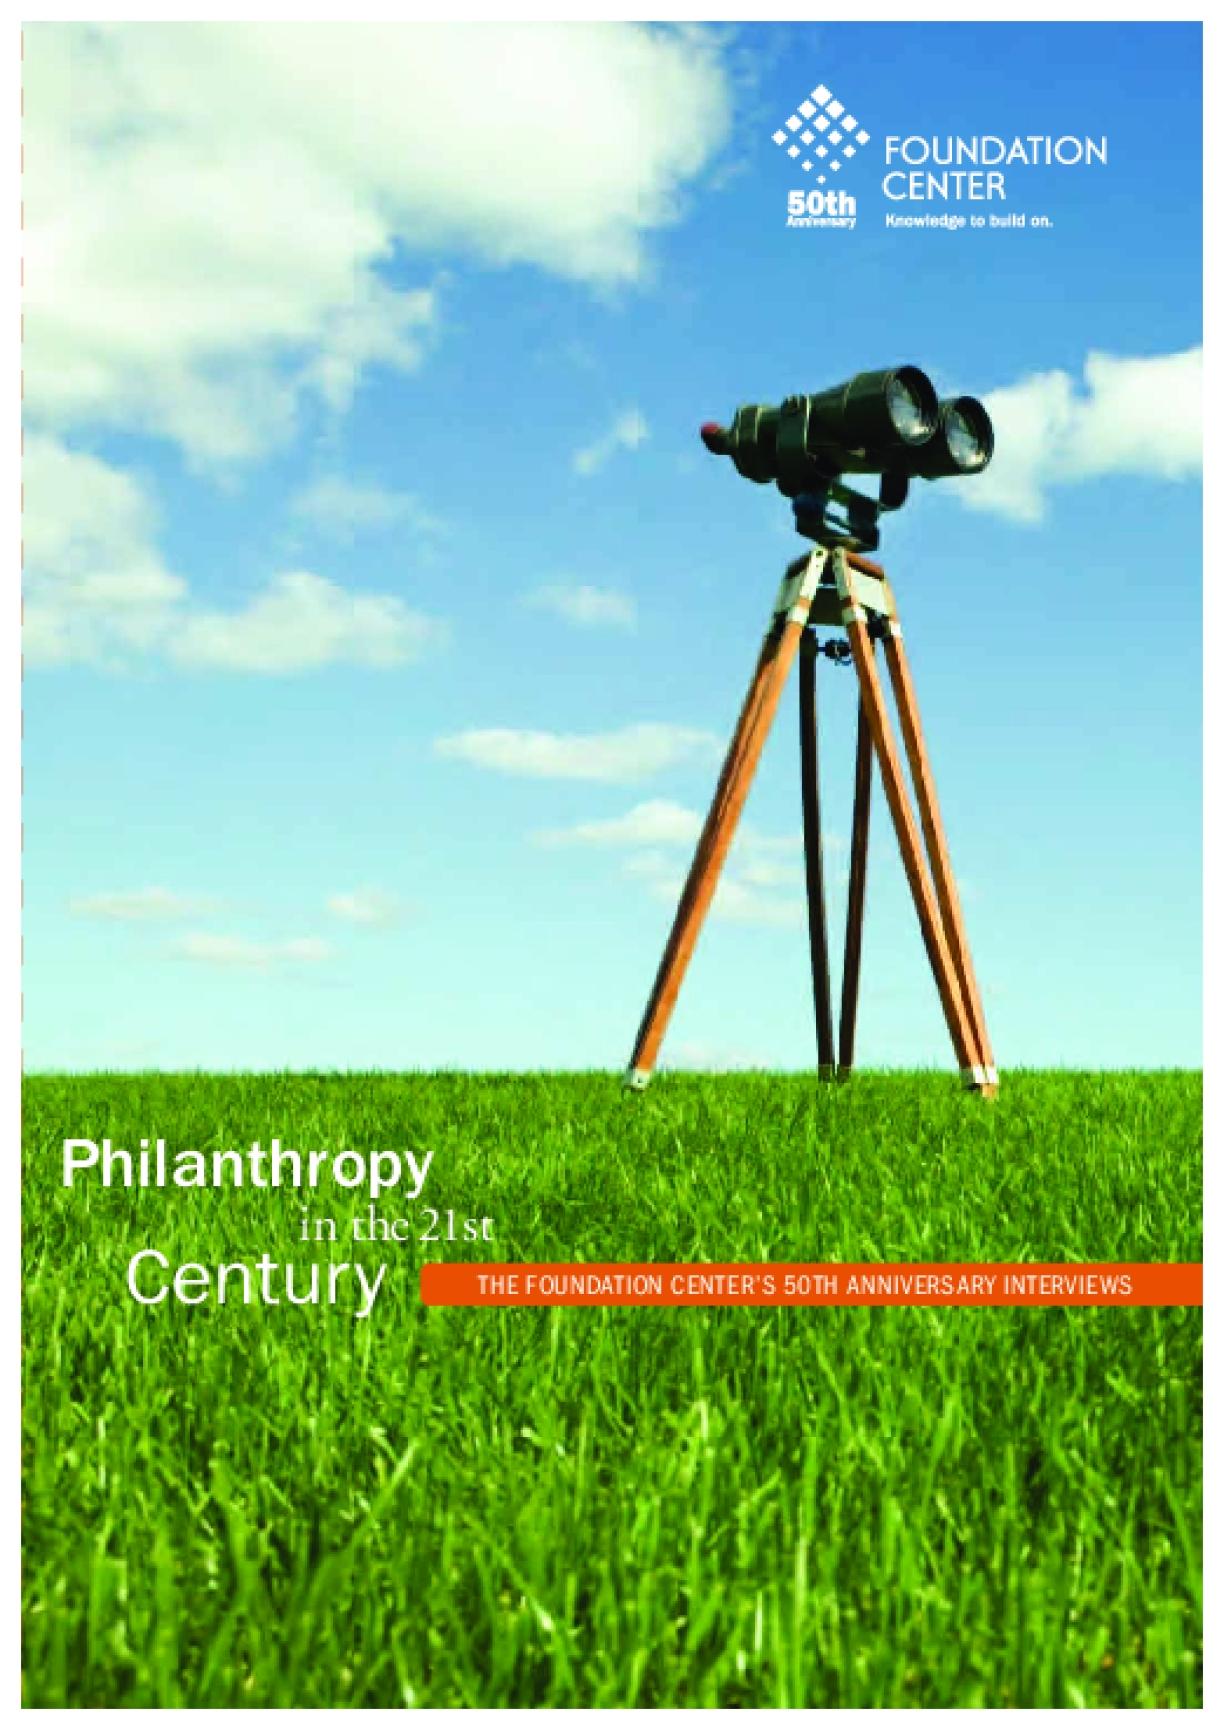 Philanthropy in the 21st Century